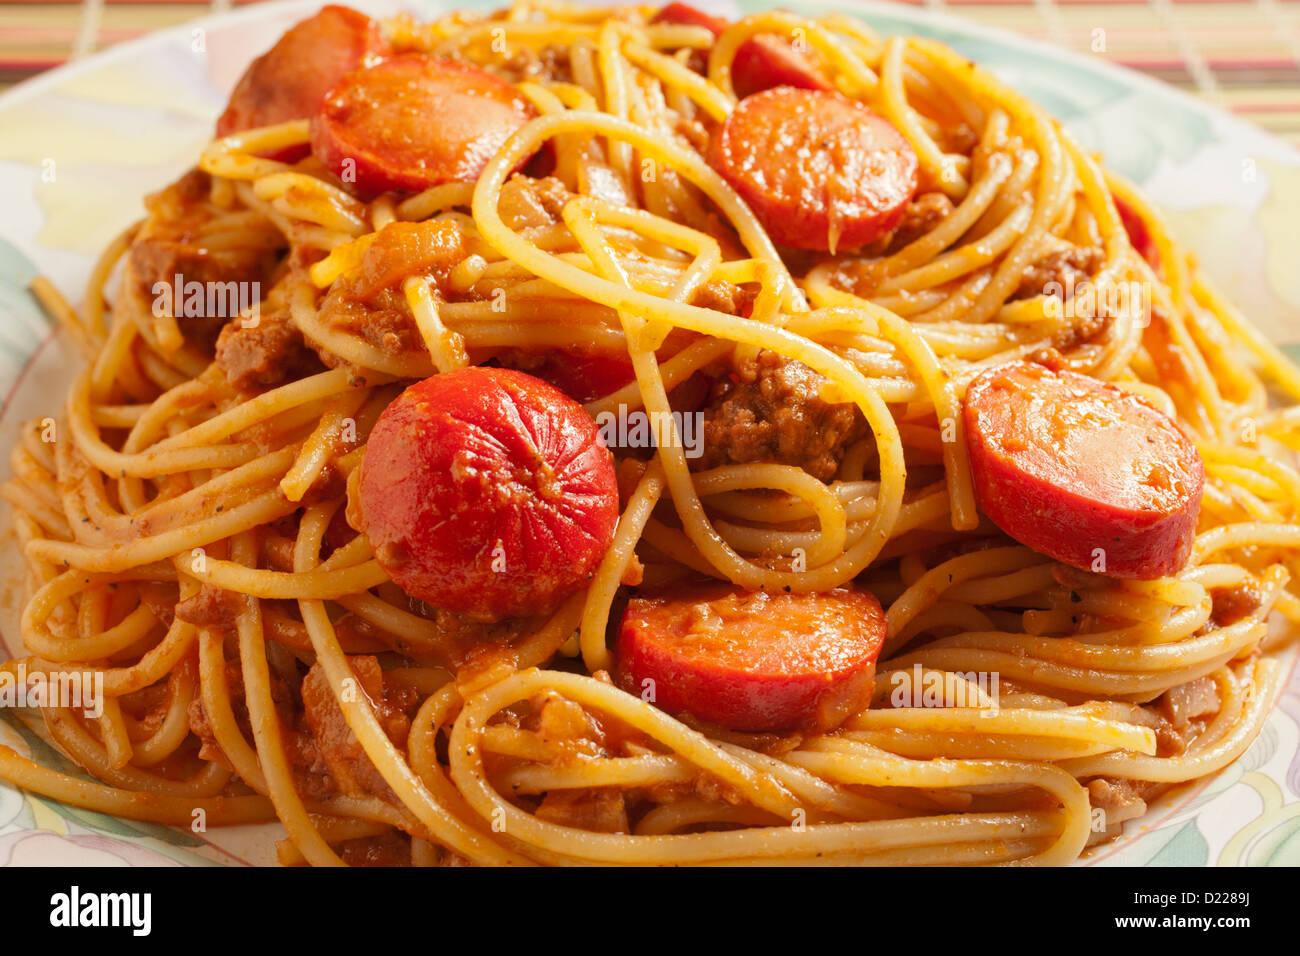 Spaghetti Noodle Hot Dogs